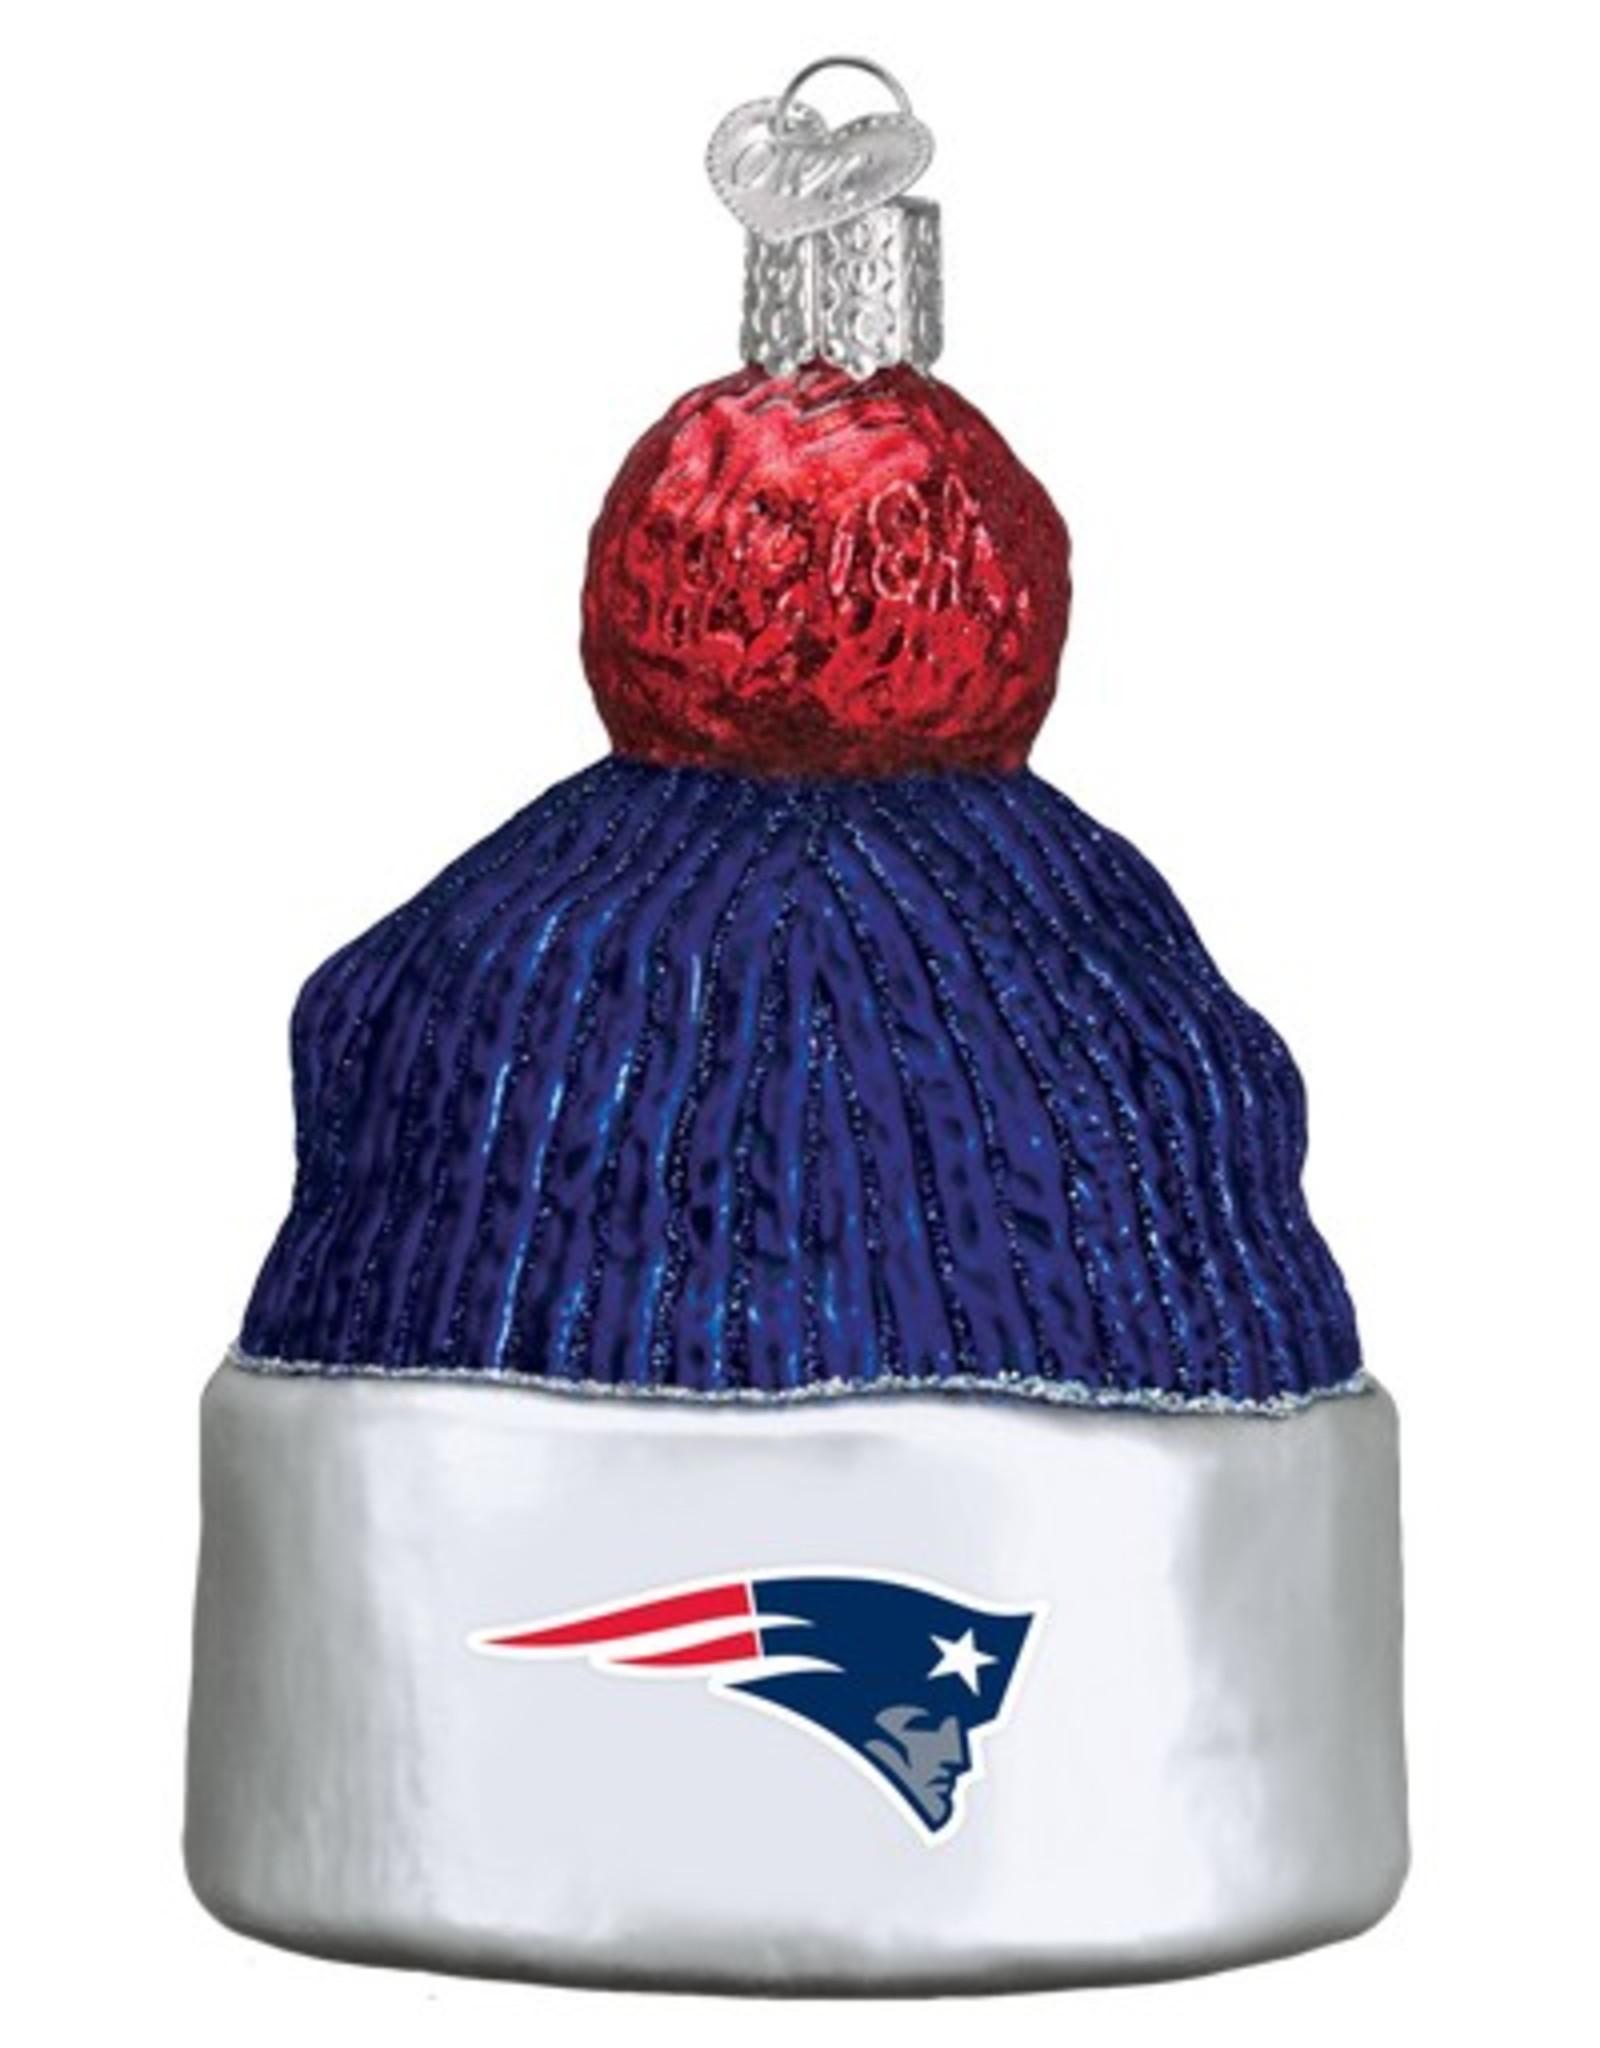 OLD WORLD CHRISTMAS New England Patriots Beanie Ornament